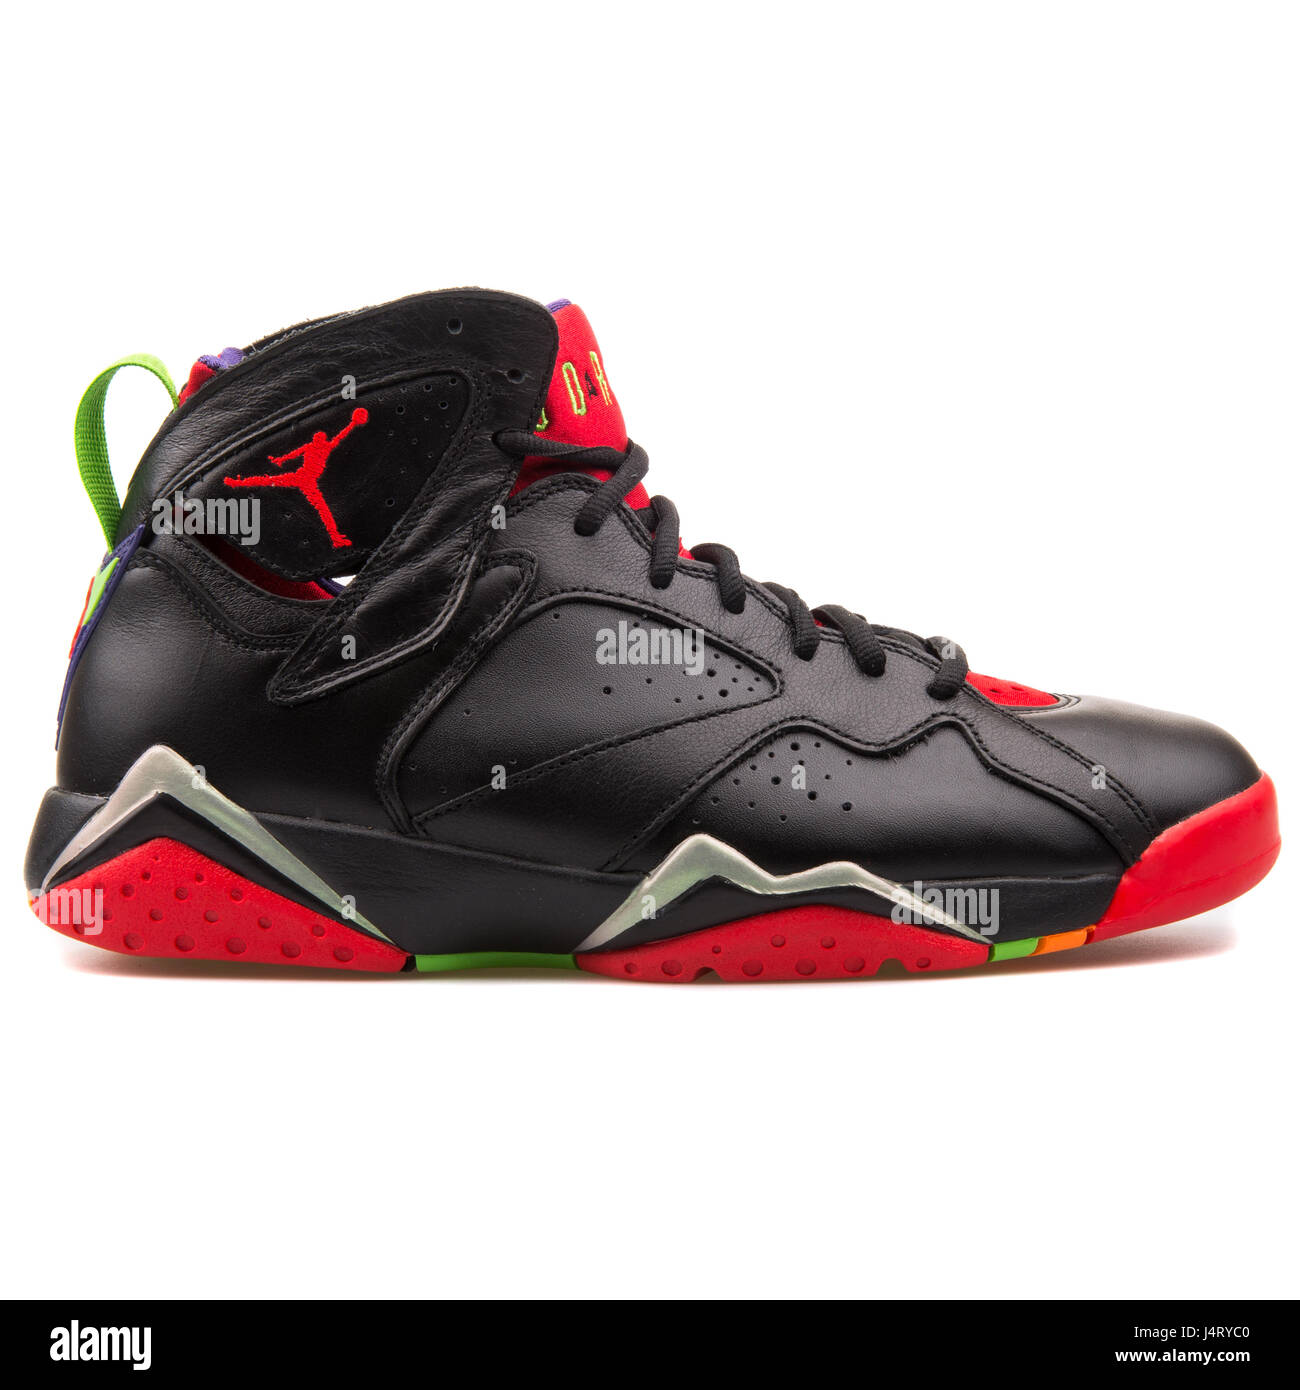 buy popular fce62 4947f Nike Air Jordan 7 Retro - 304775-029 Stock Photo: 140667968 ...